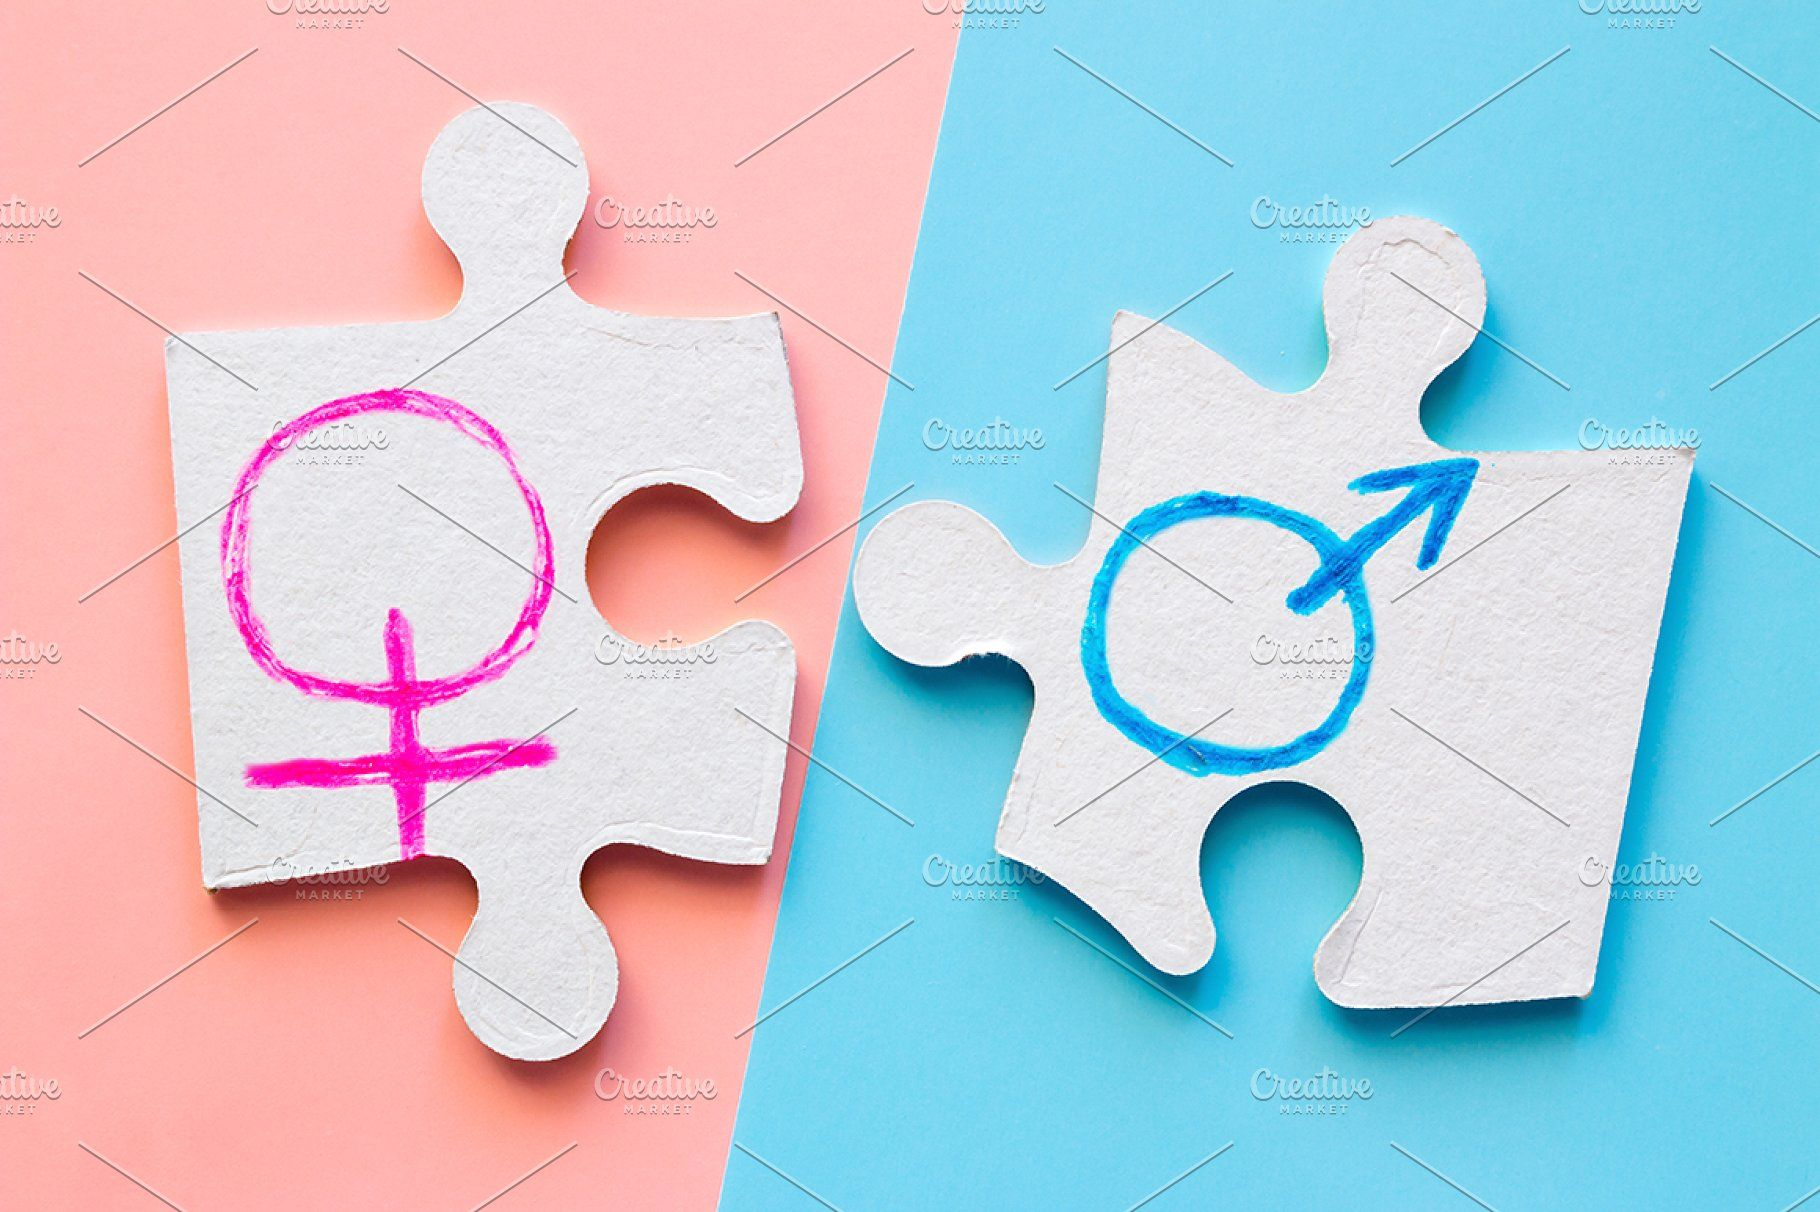 Male And Female Gender Symbols Symbols Book Photography Female Symbol